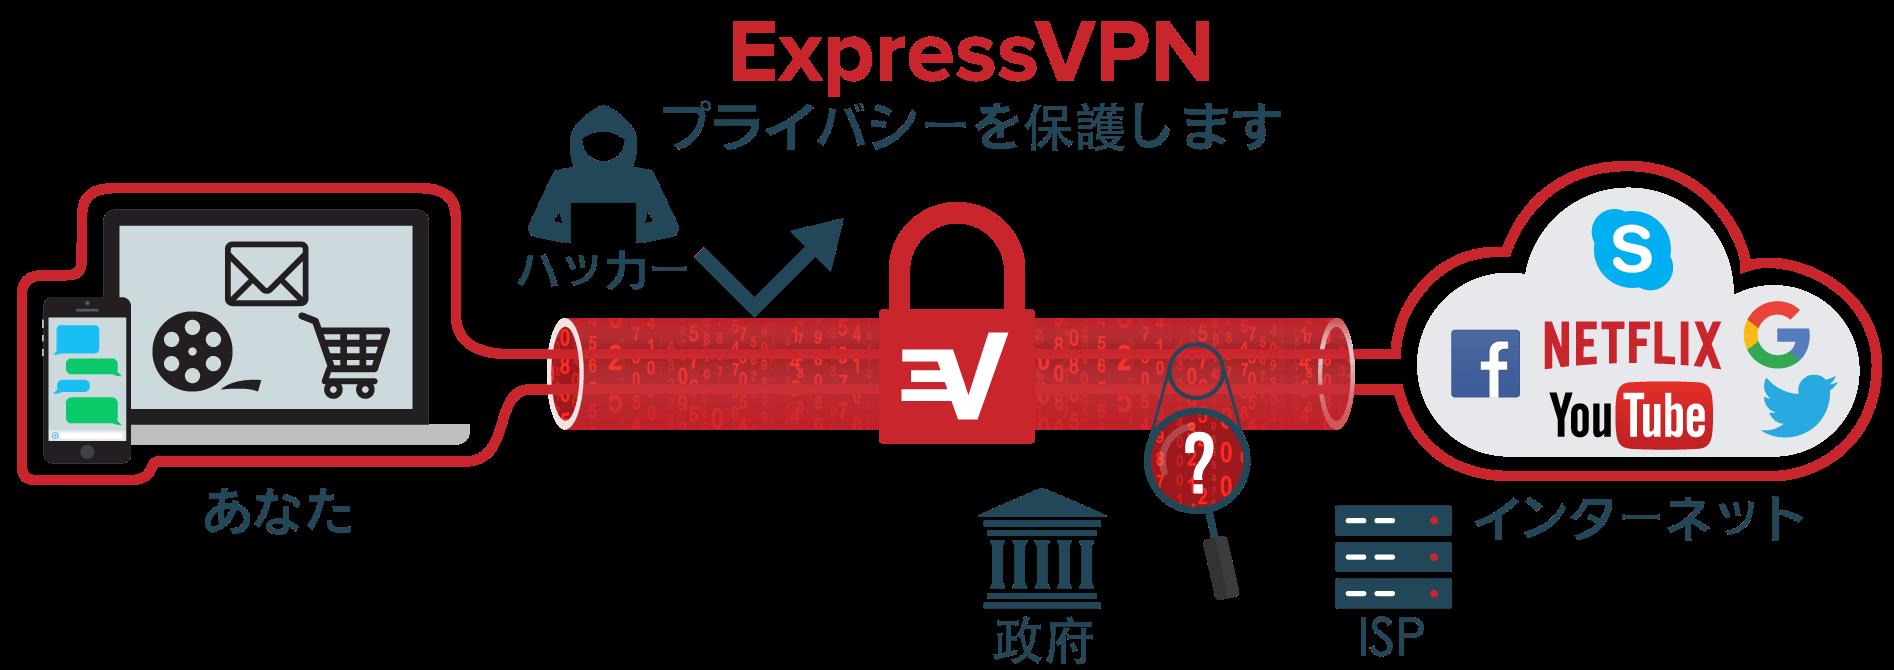 VPNの仕組みを図解で説明